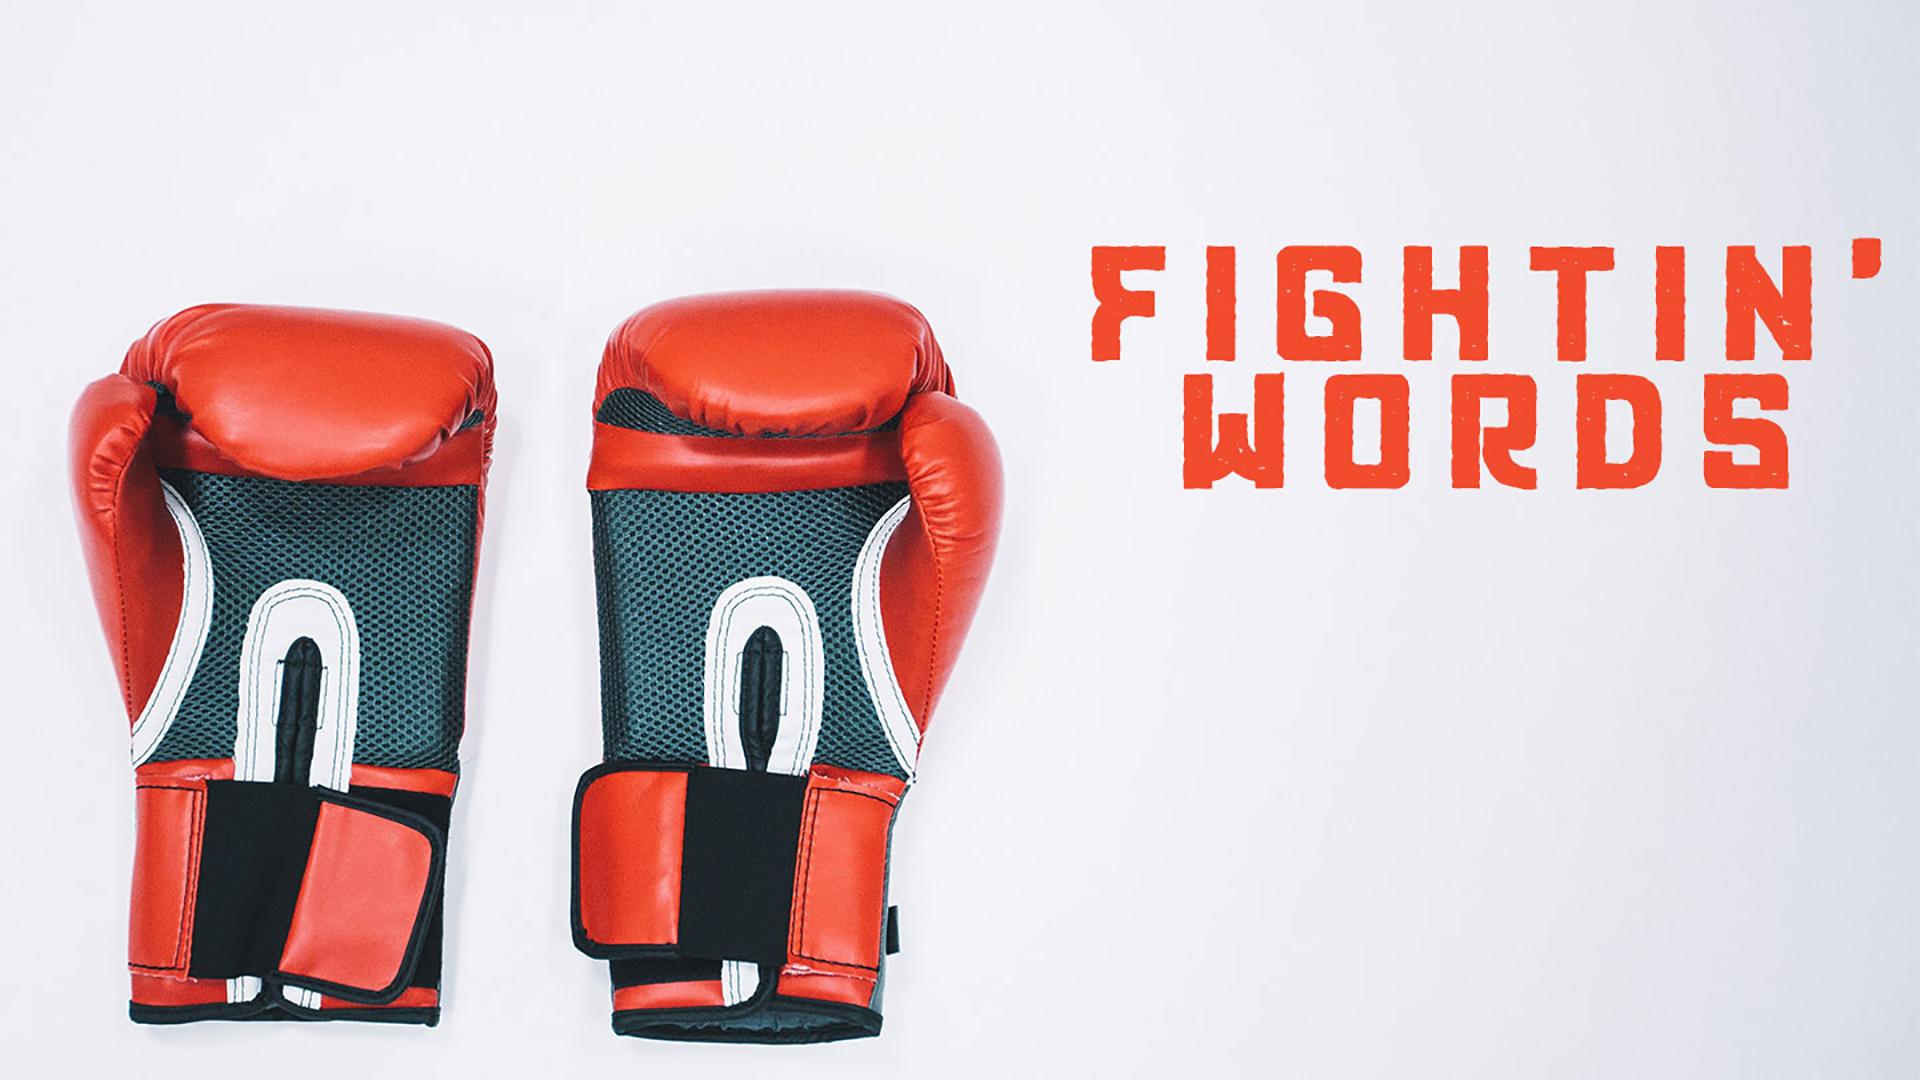 Series: Fightin' Words